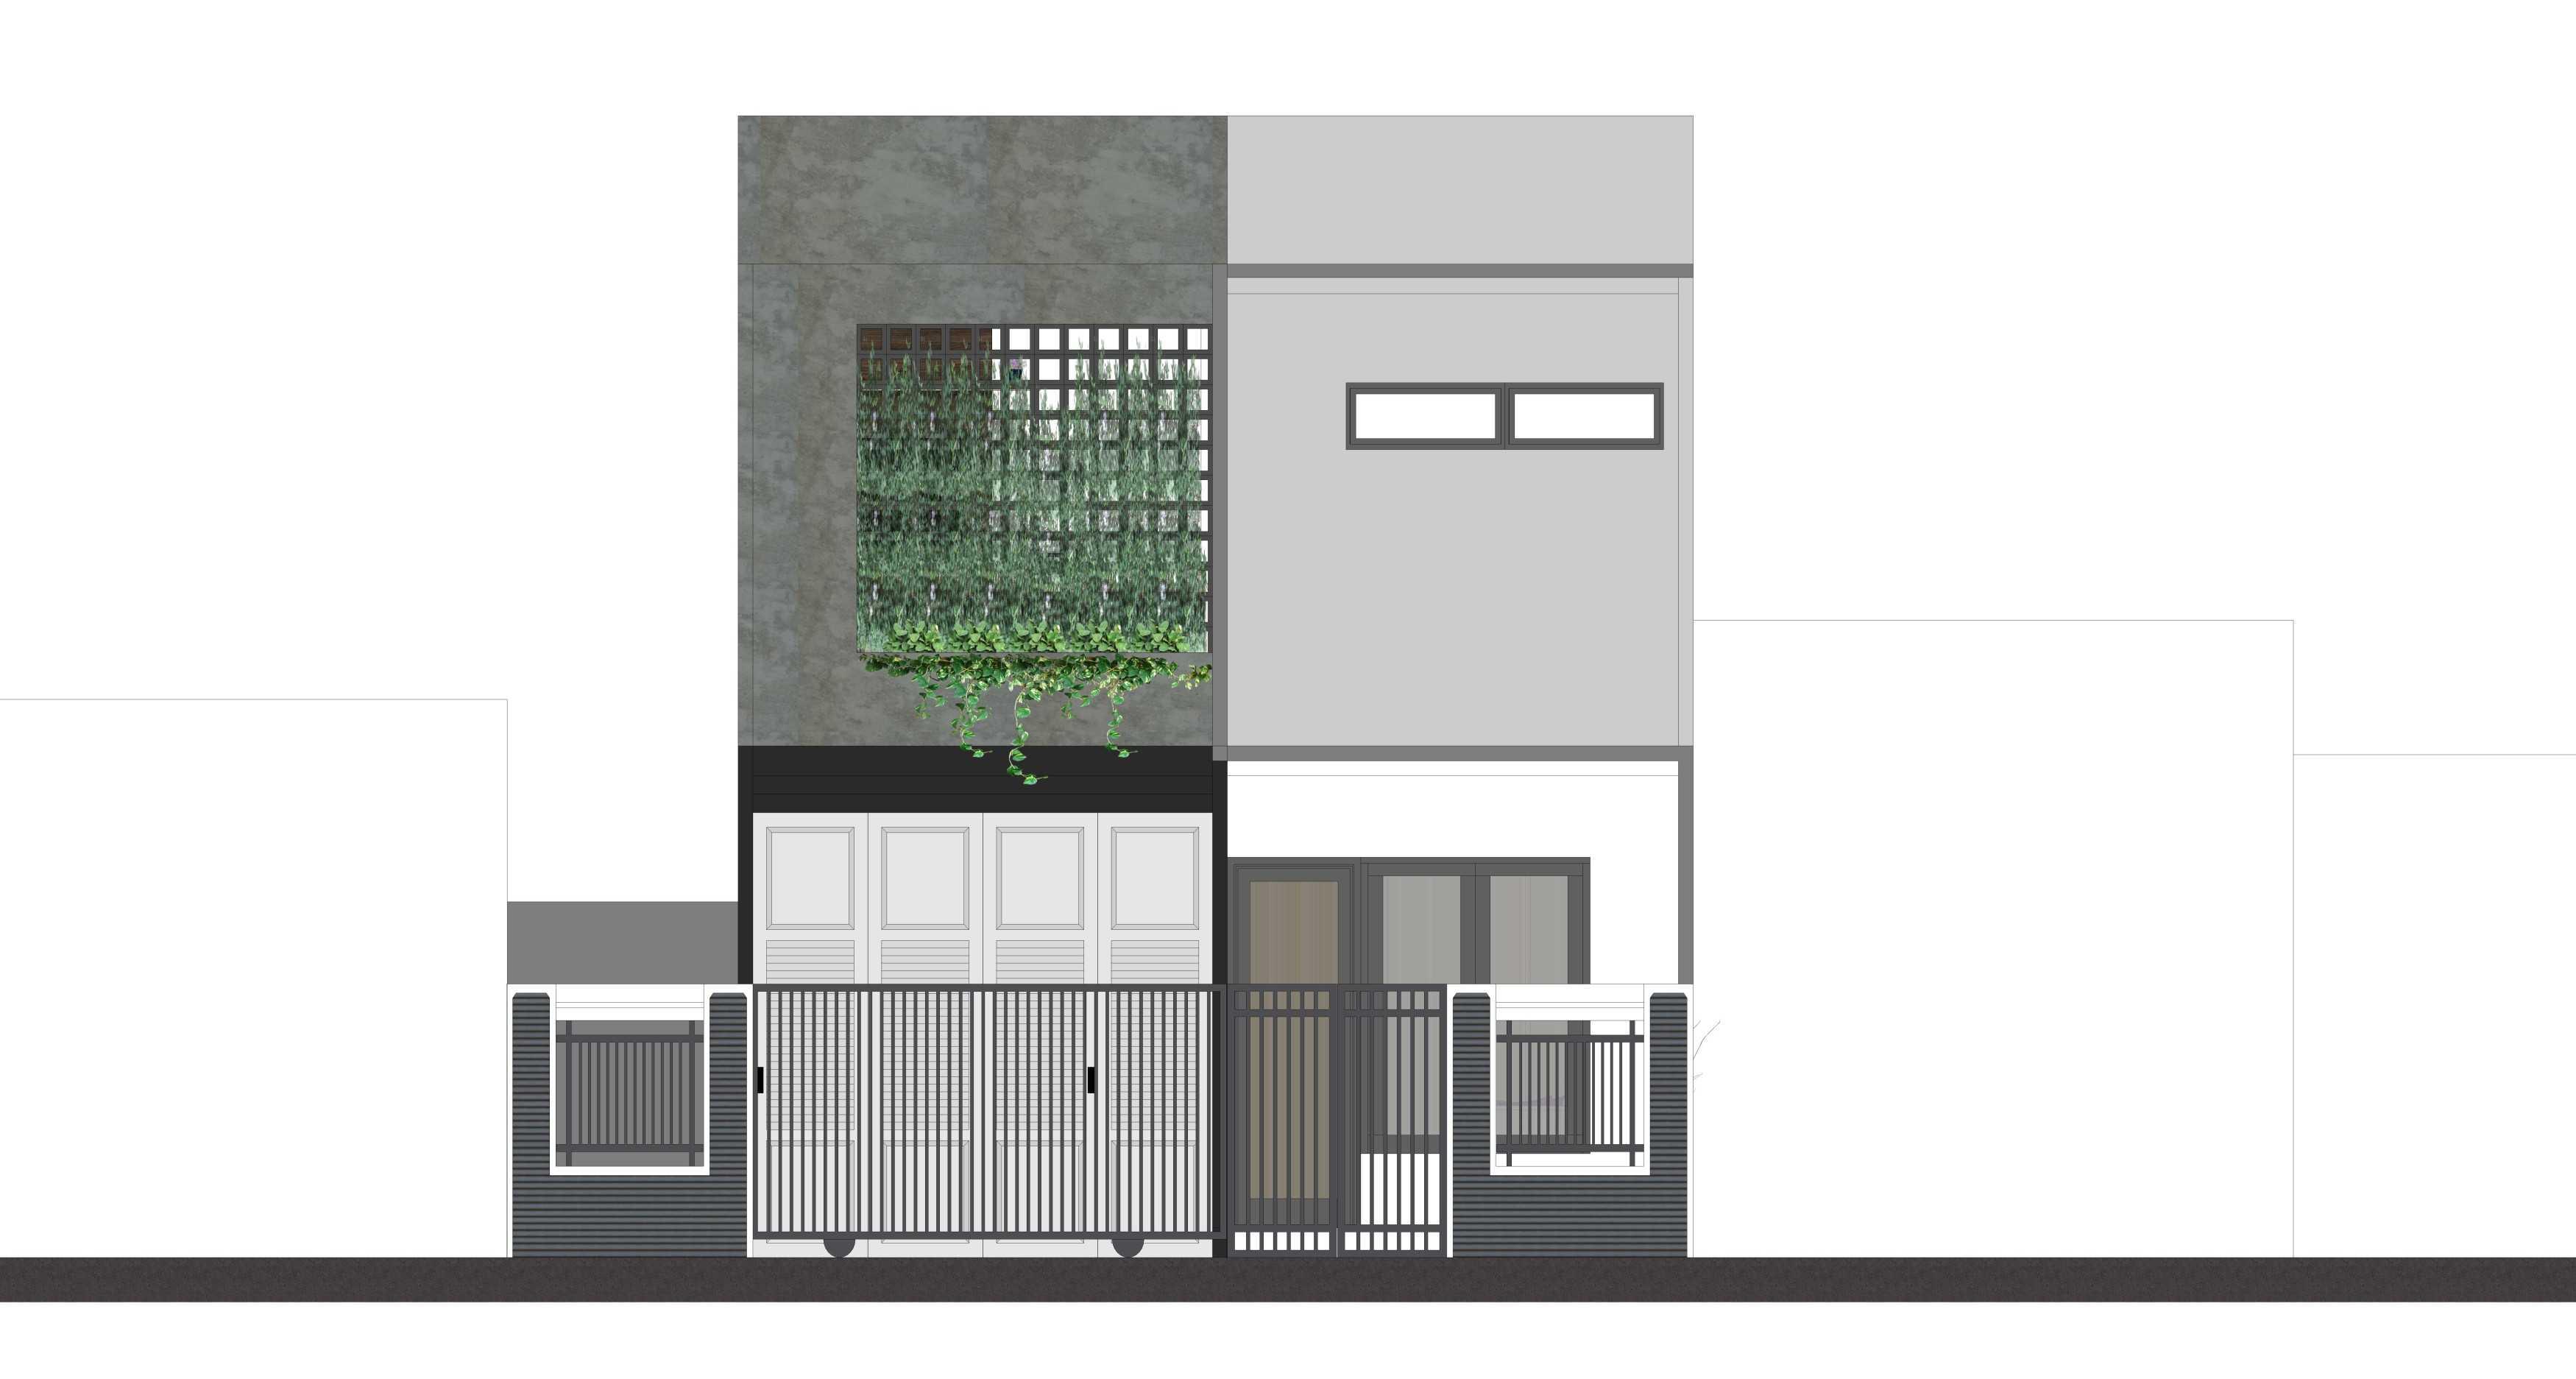 Astabumi Architect & Interior Design Omah De'poso Tegal, Jawa Tengah, Indonesia Tegal, Jawa Tengah, Indonesia Front View Rendering   49850